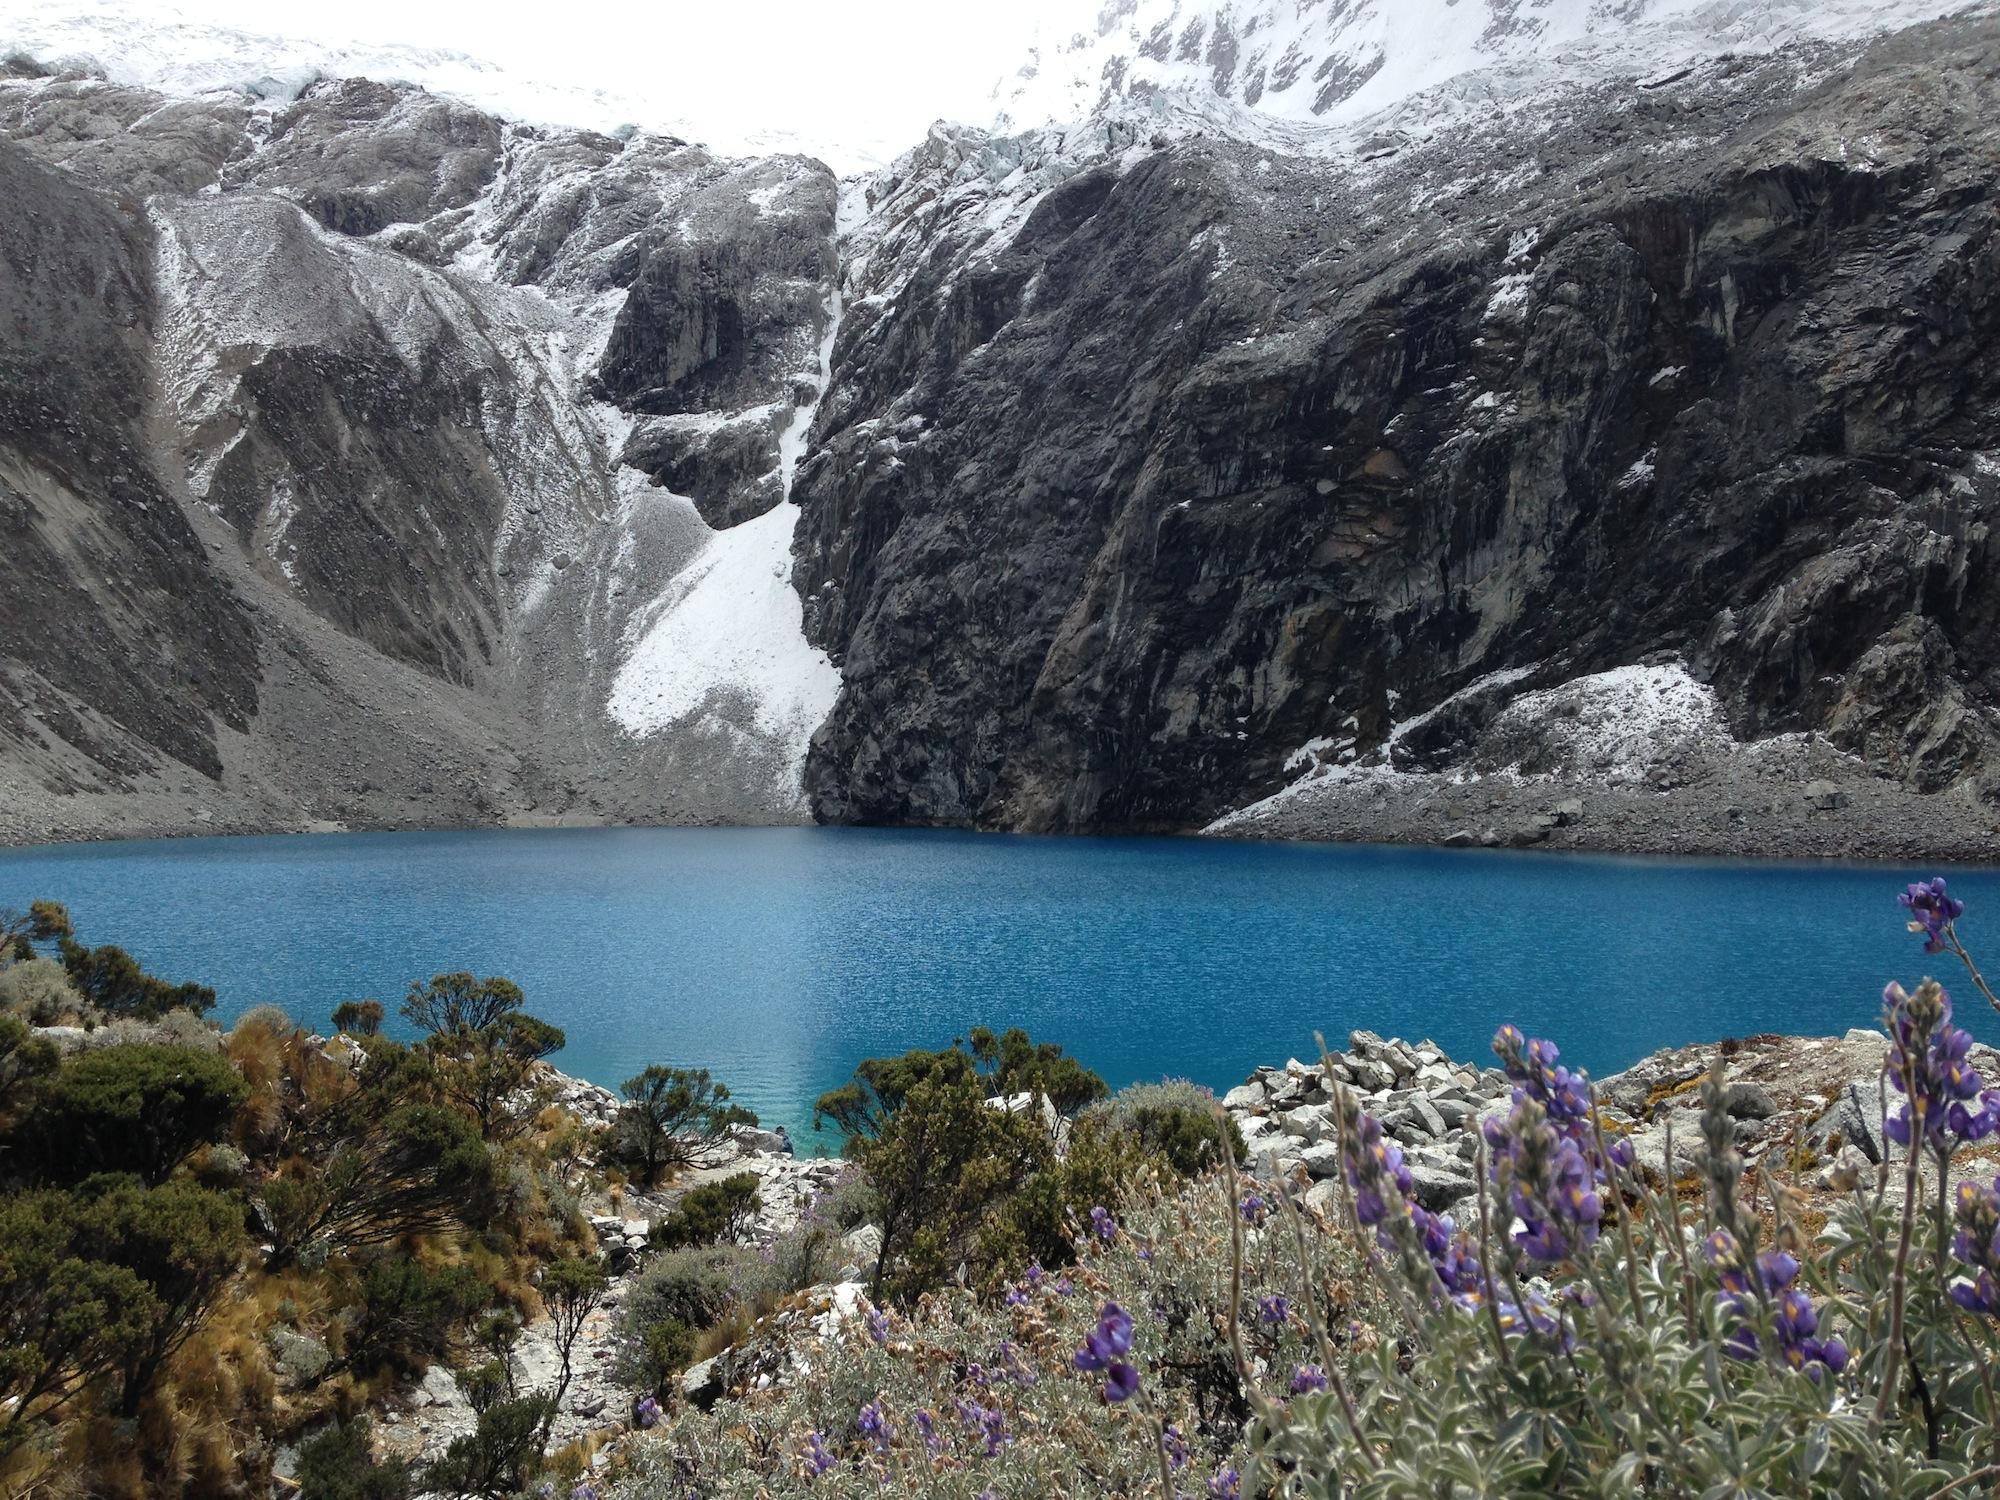 Raymondpoort Com  U00bb Blog Archive Peru  Hiking The Andes